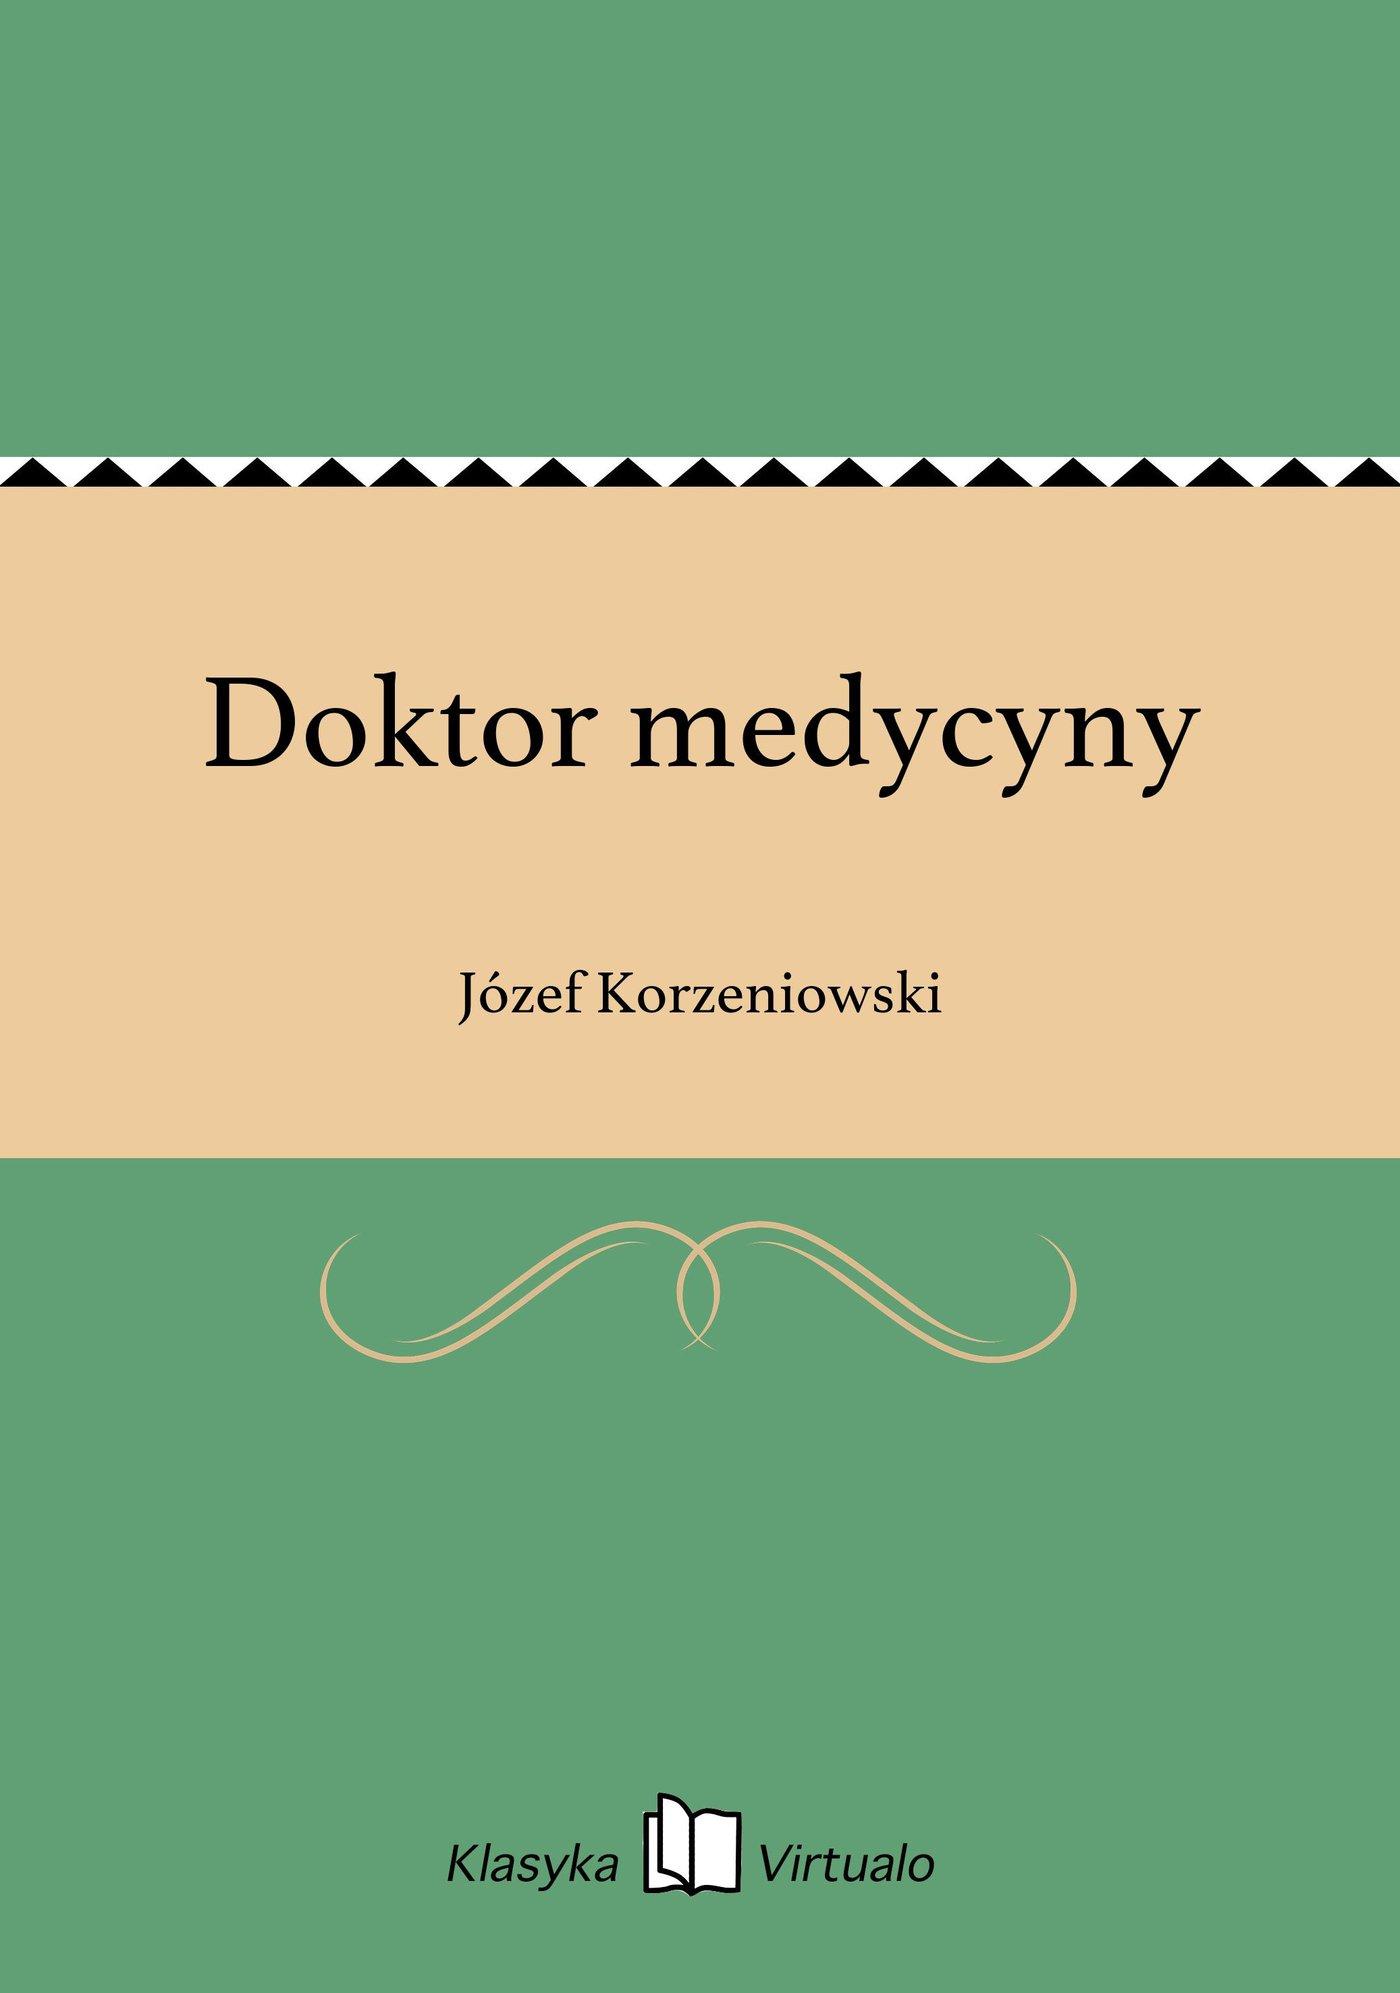 Doktor medycyny - Ebook (Książka EPUB) do pobrania w formacie EPUB